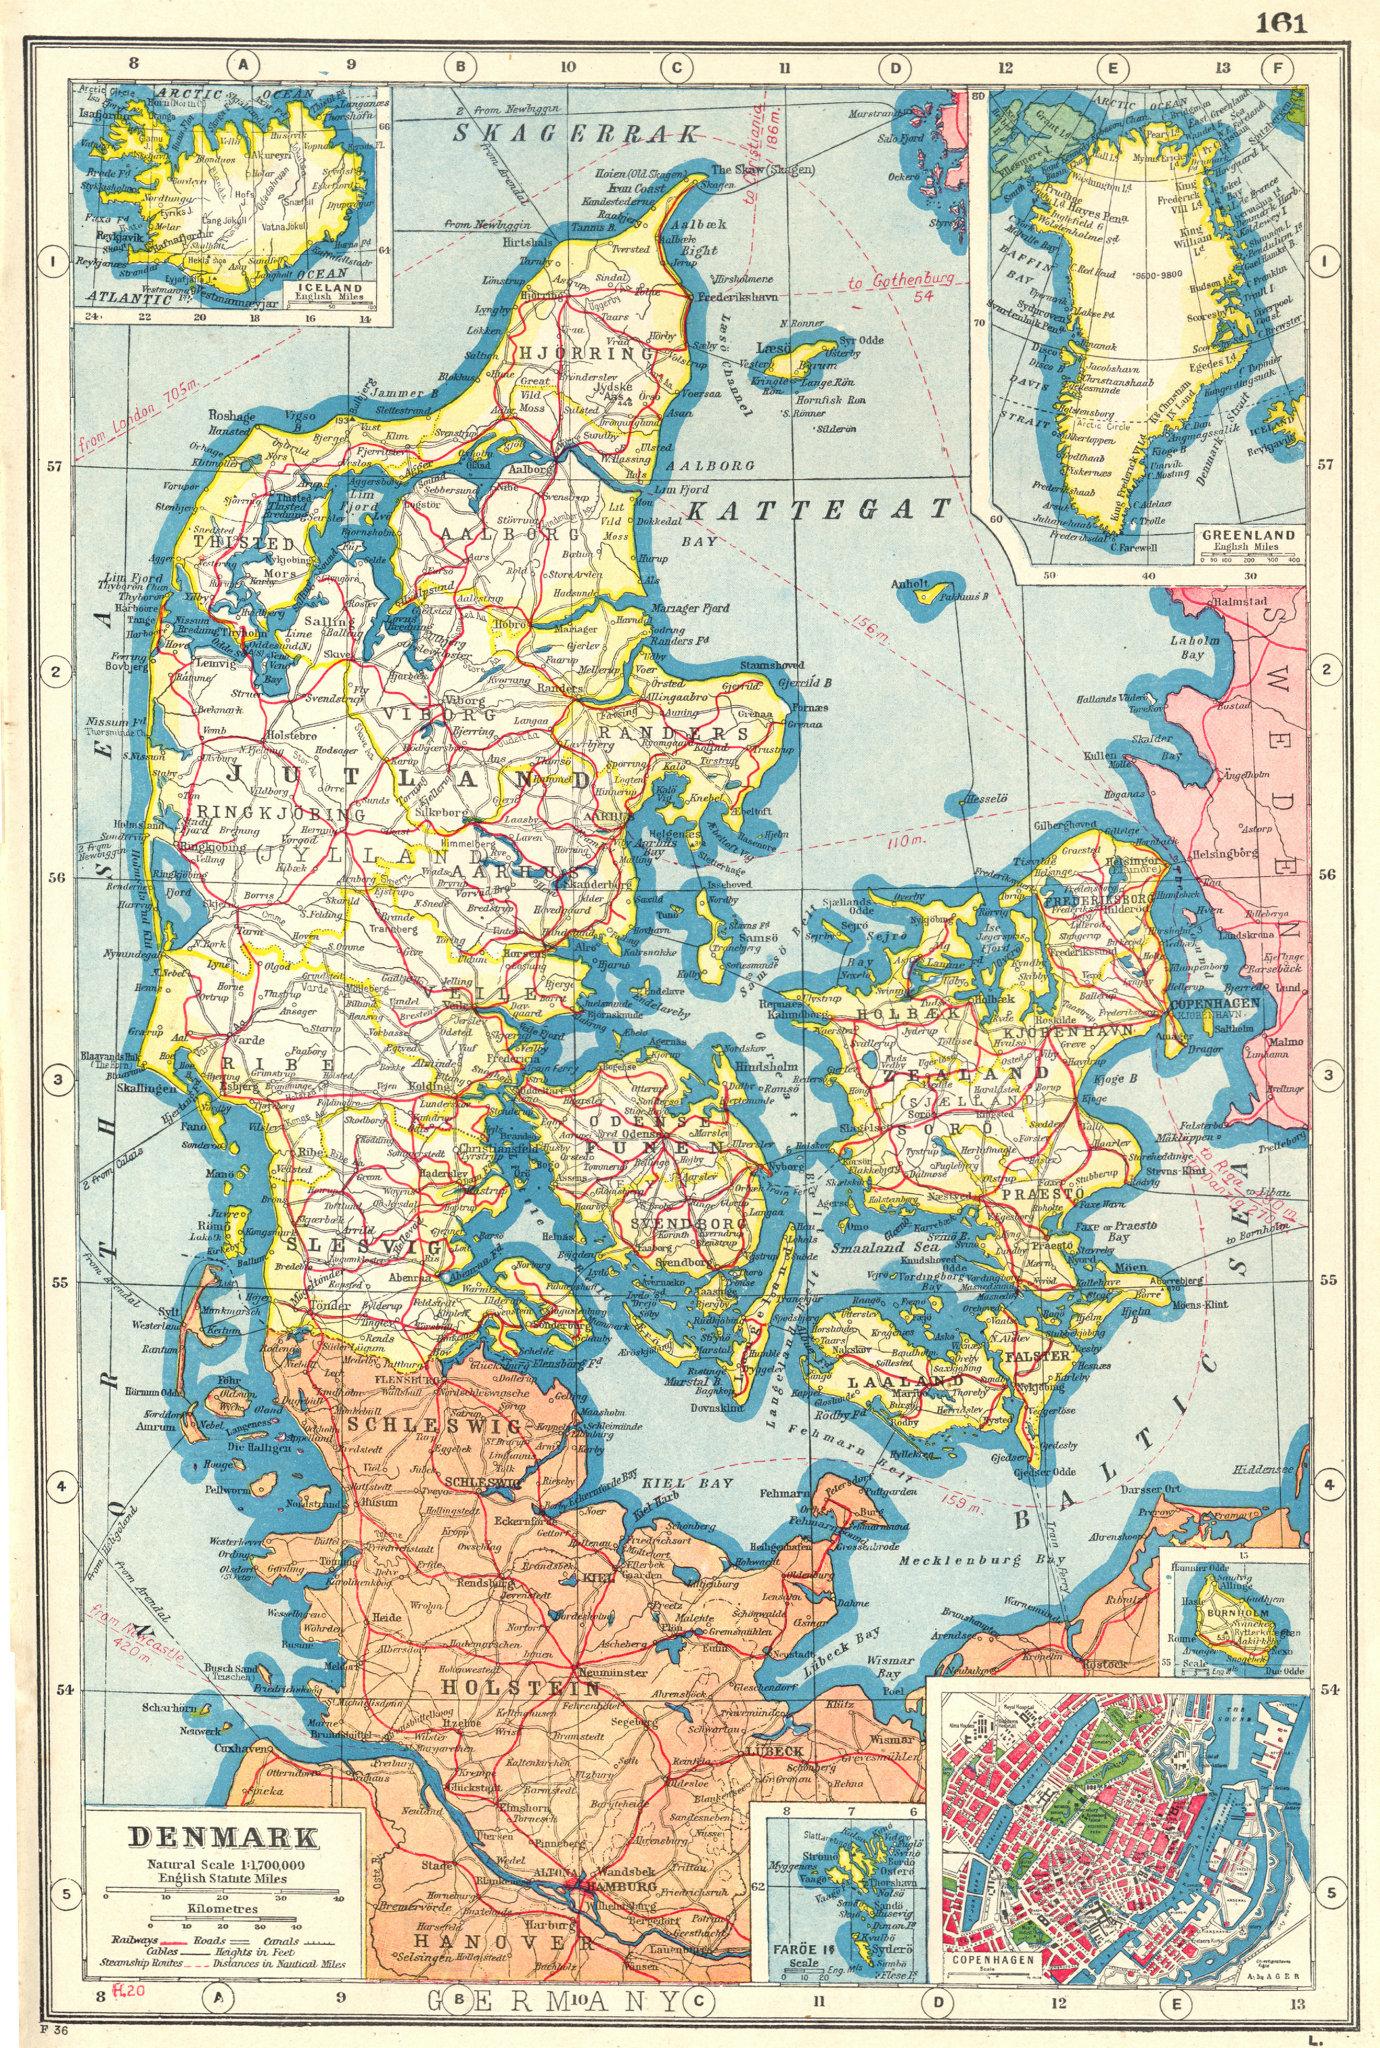 Associate Product DENMARK. inset Iceland Greenland Faroe islands Copenhagen Bornholm 1920 map